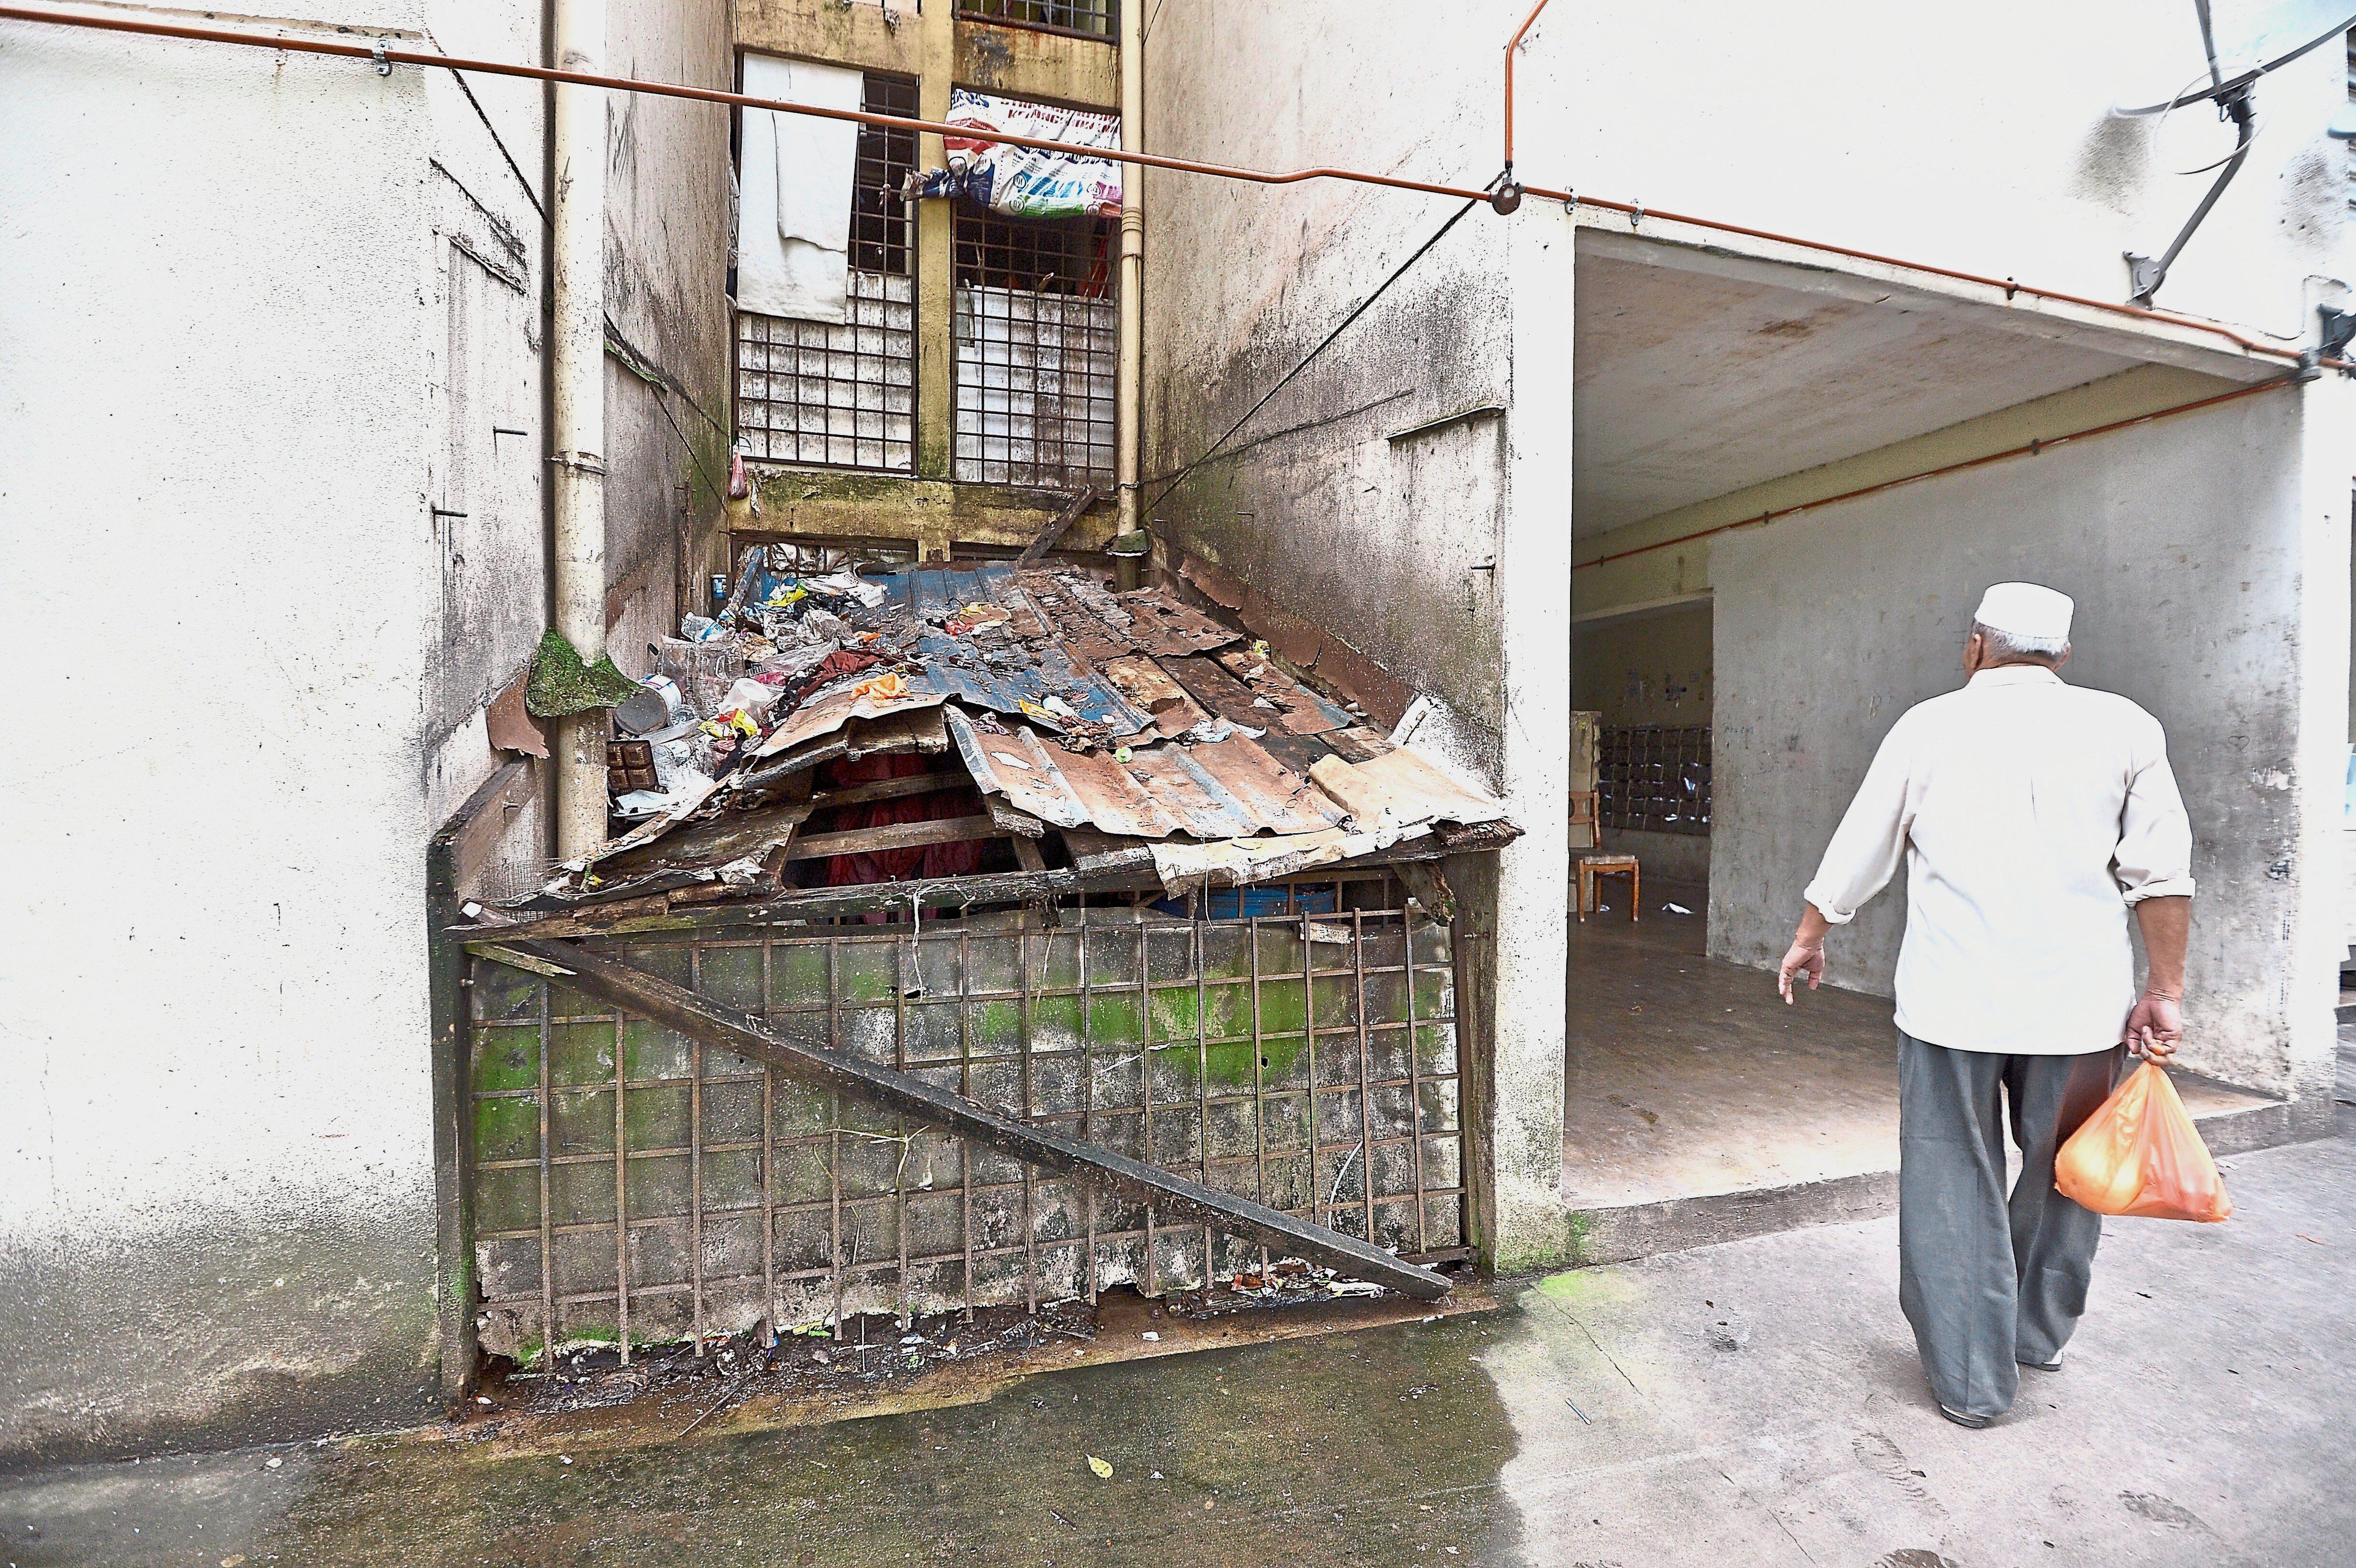 Dirty and deplorable living condition at PPR Taman Putra Damai Lembah Subang in Kelana Jaya